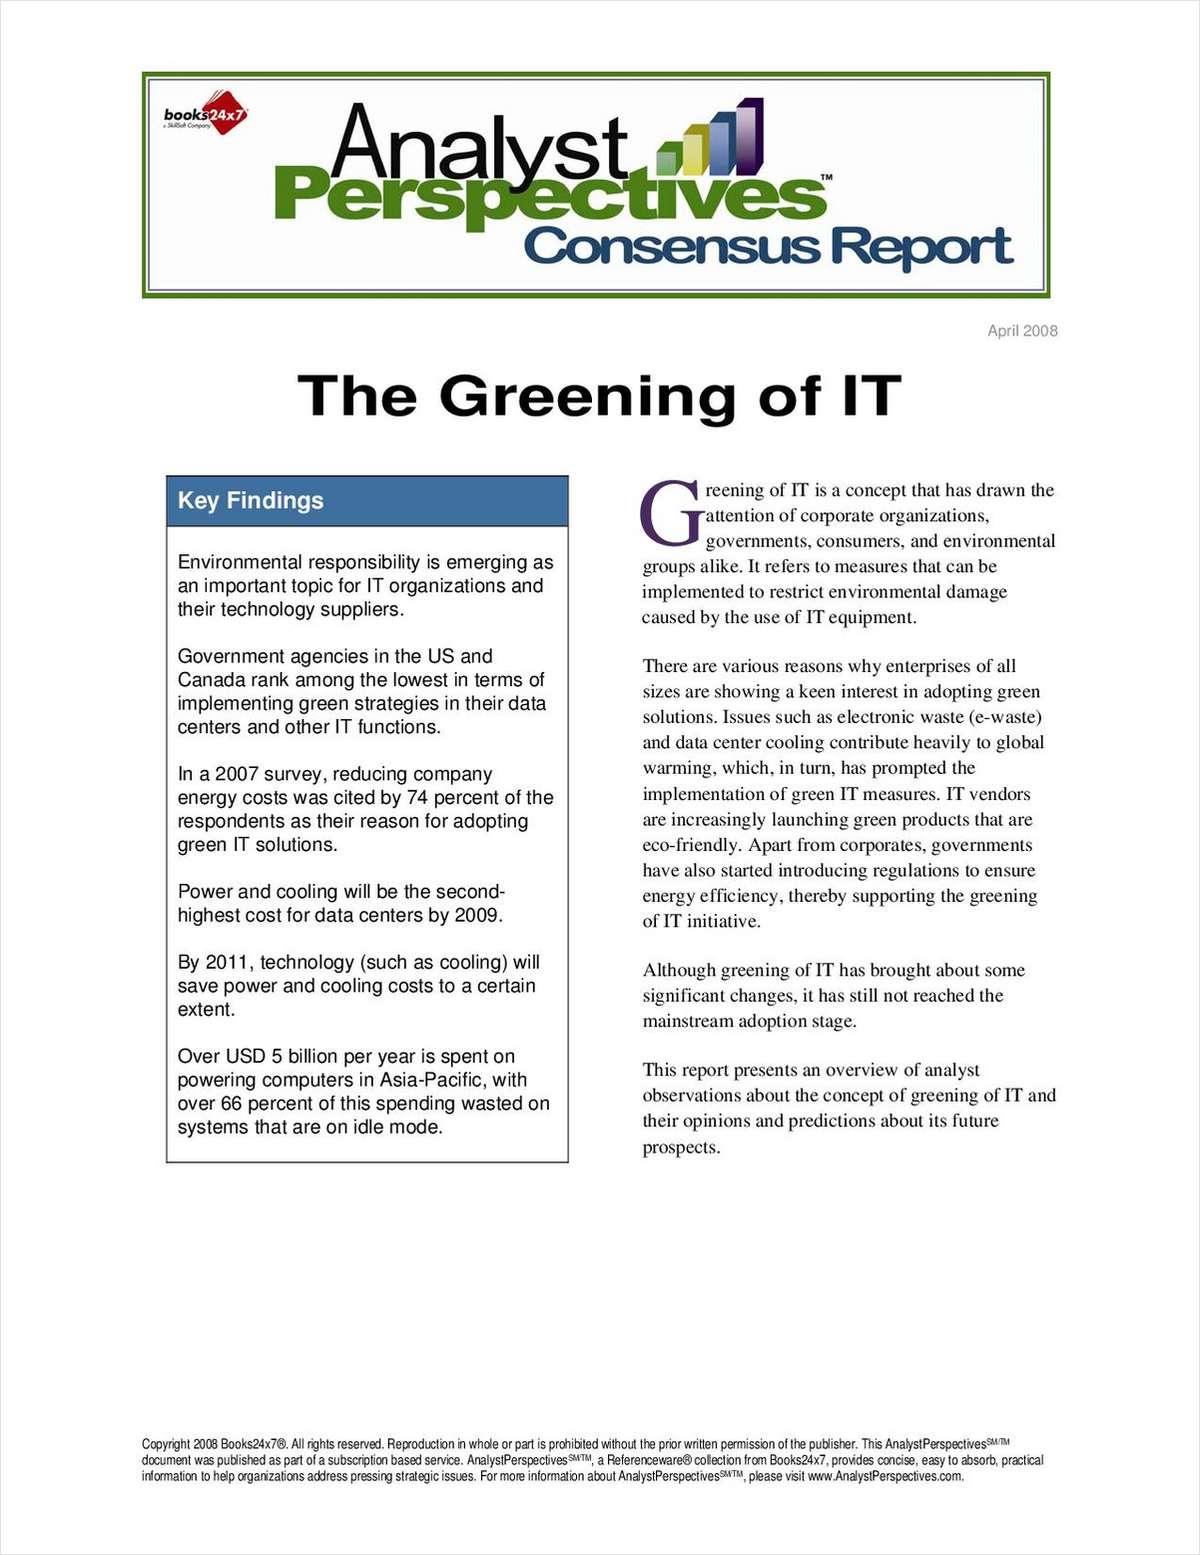 The Greening of IT